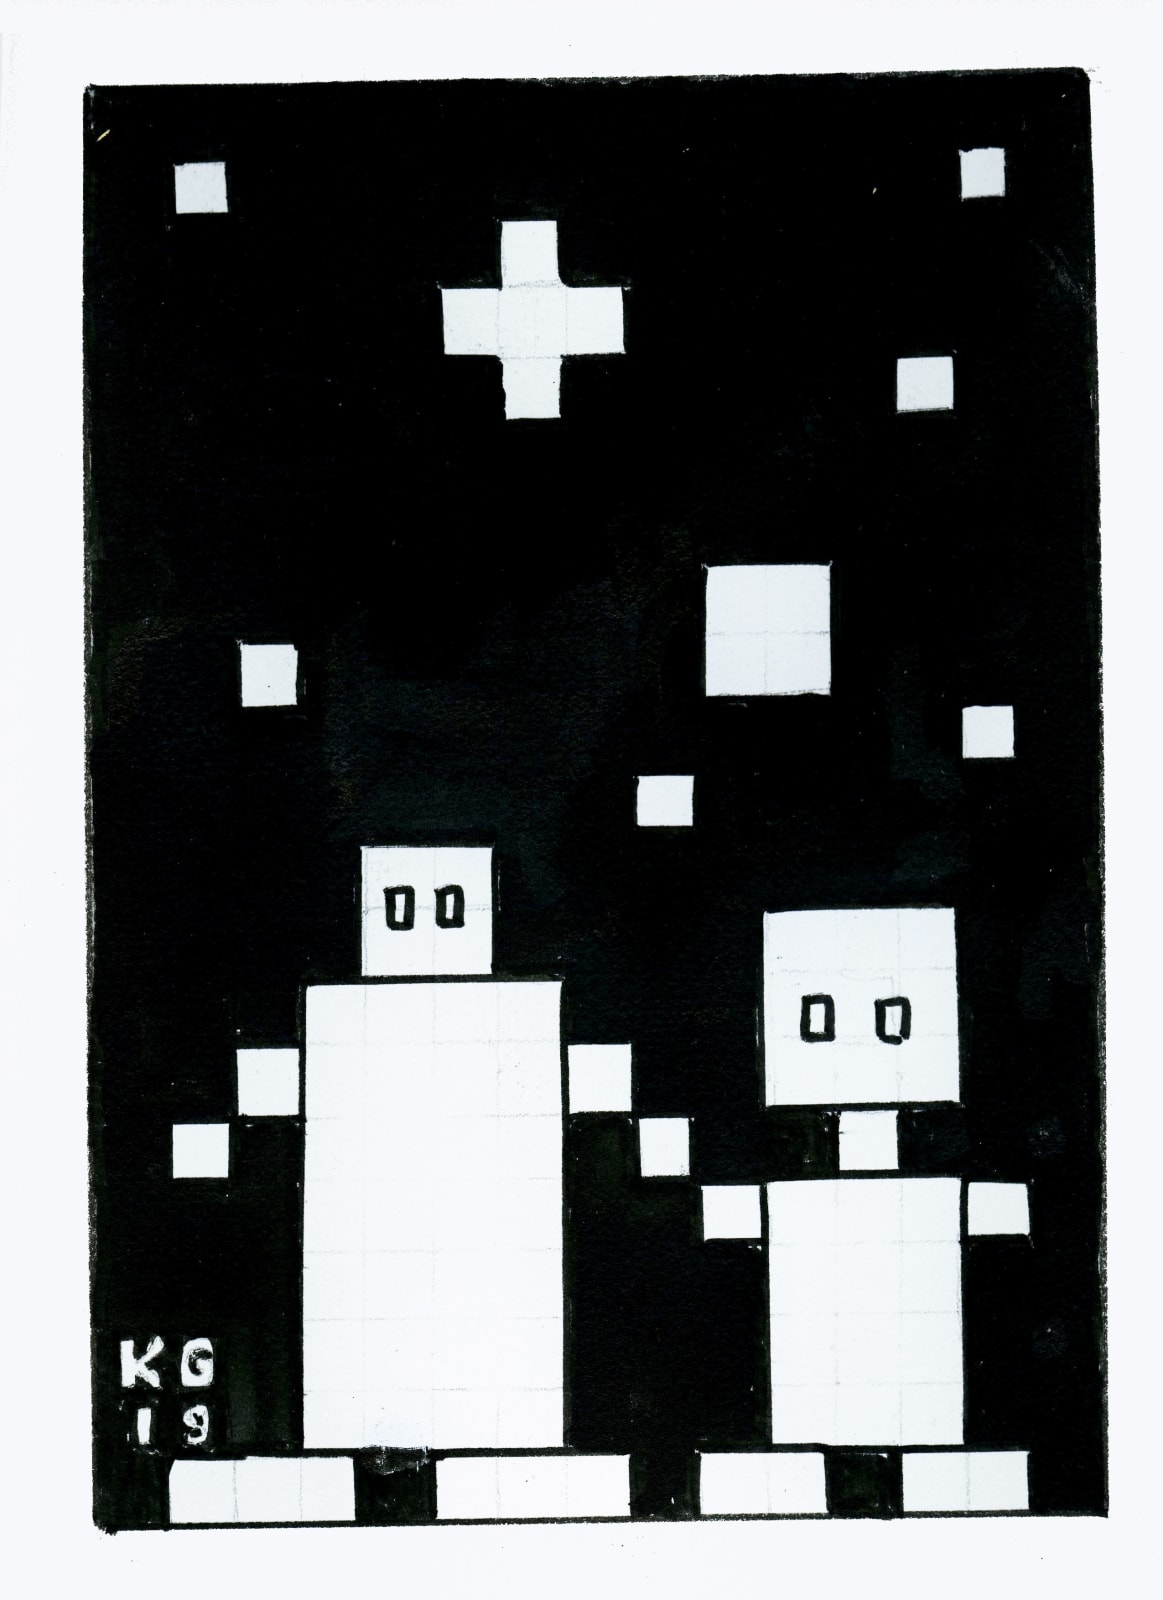 KG 462